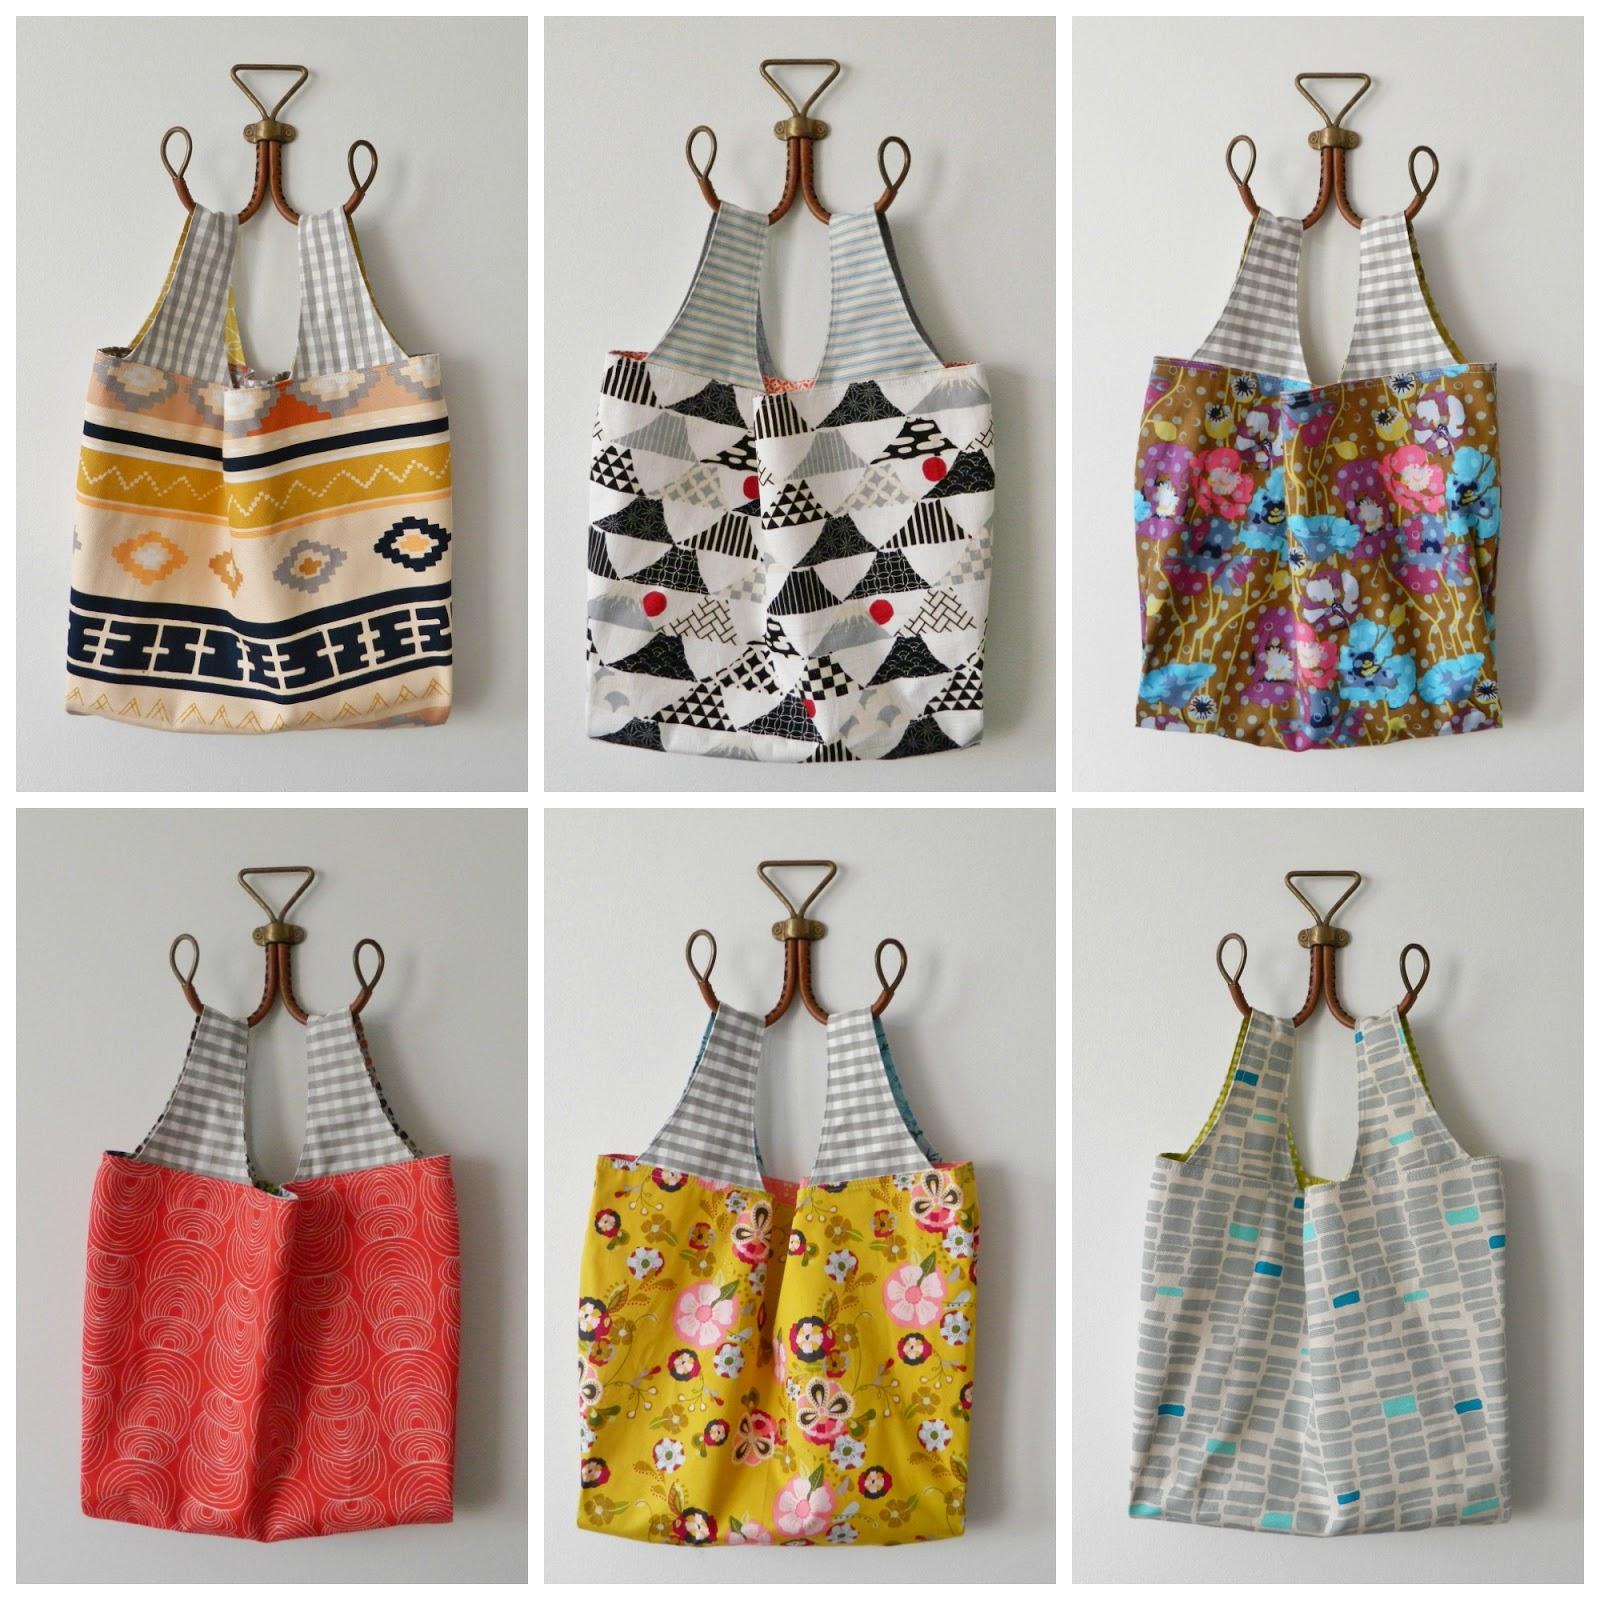 S O T A K Handmade Reusable Grocery Bags